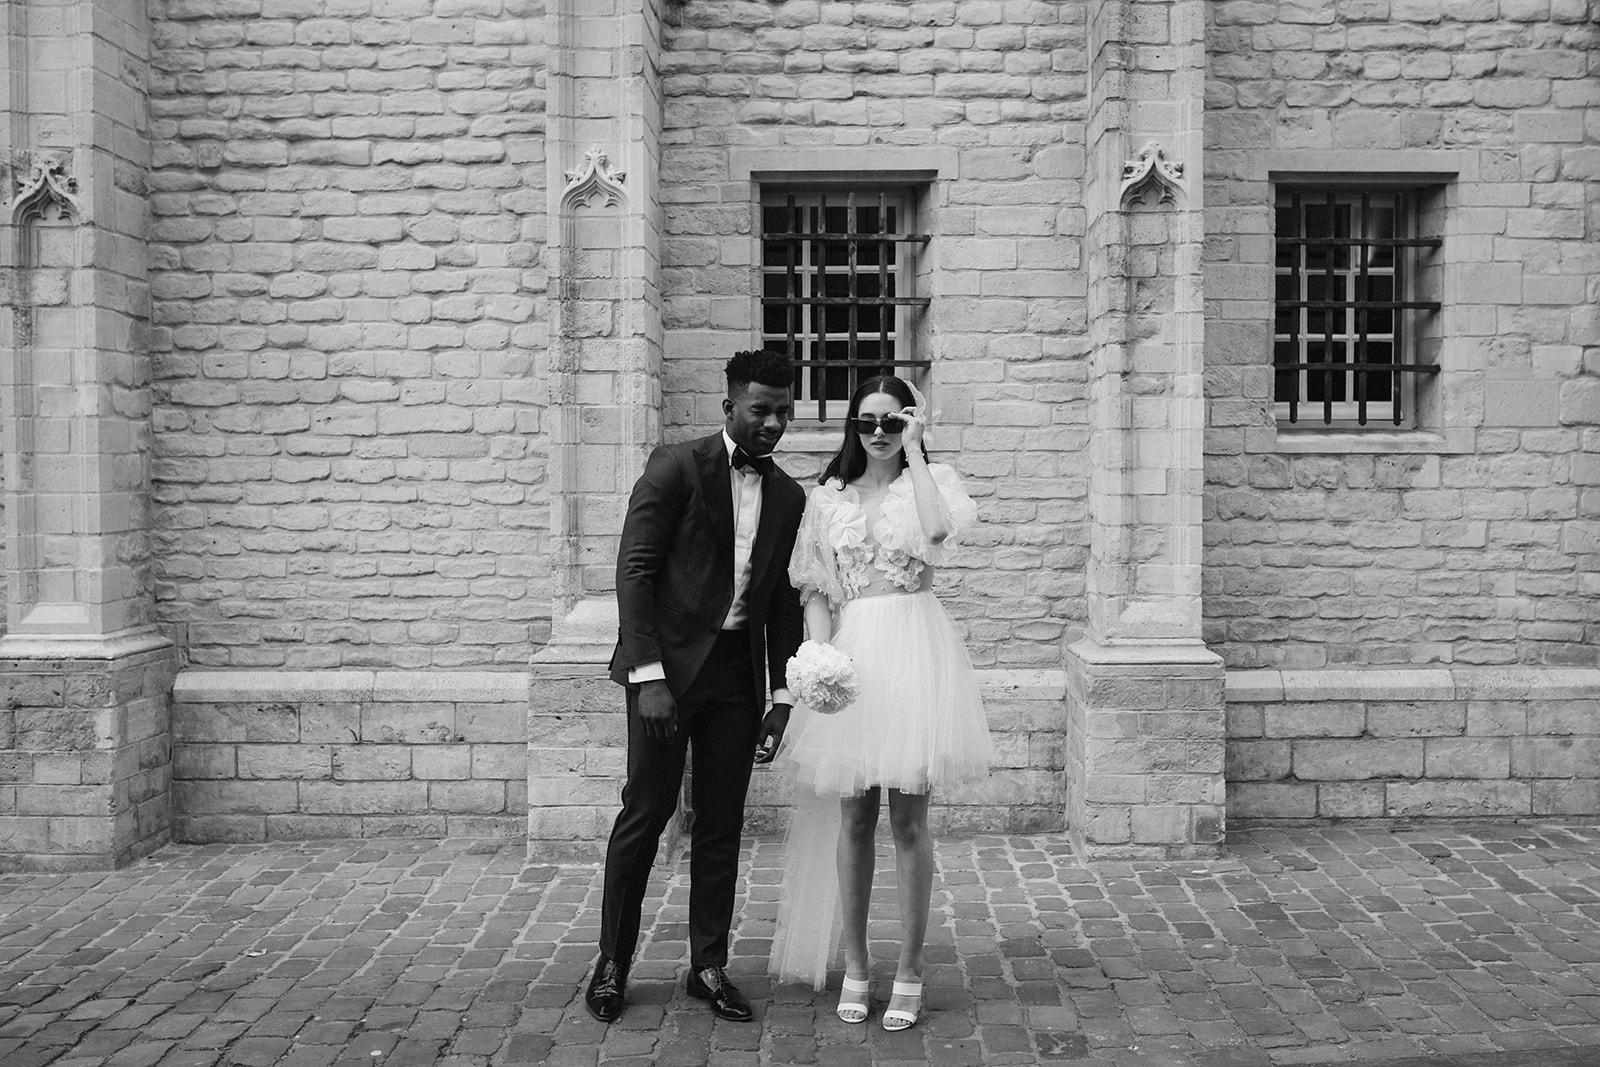 Minimalistische trouwjurk, minimal weddingdress, sustainable weddingdress, duurzame trouwjurk, hanneke peters couture, liselore stap